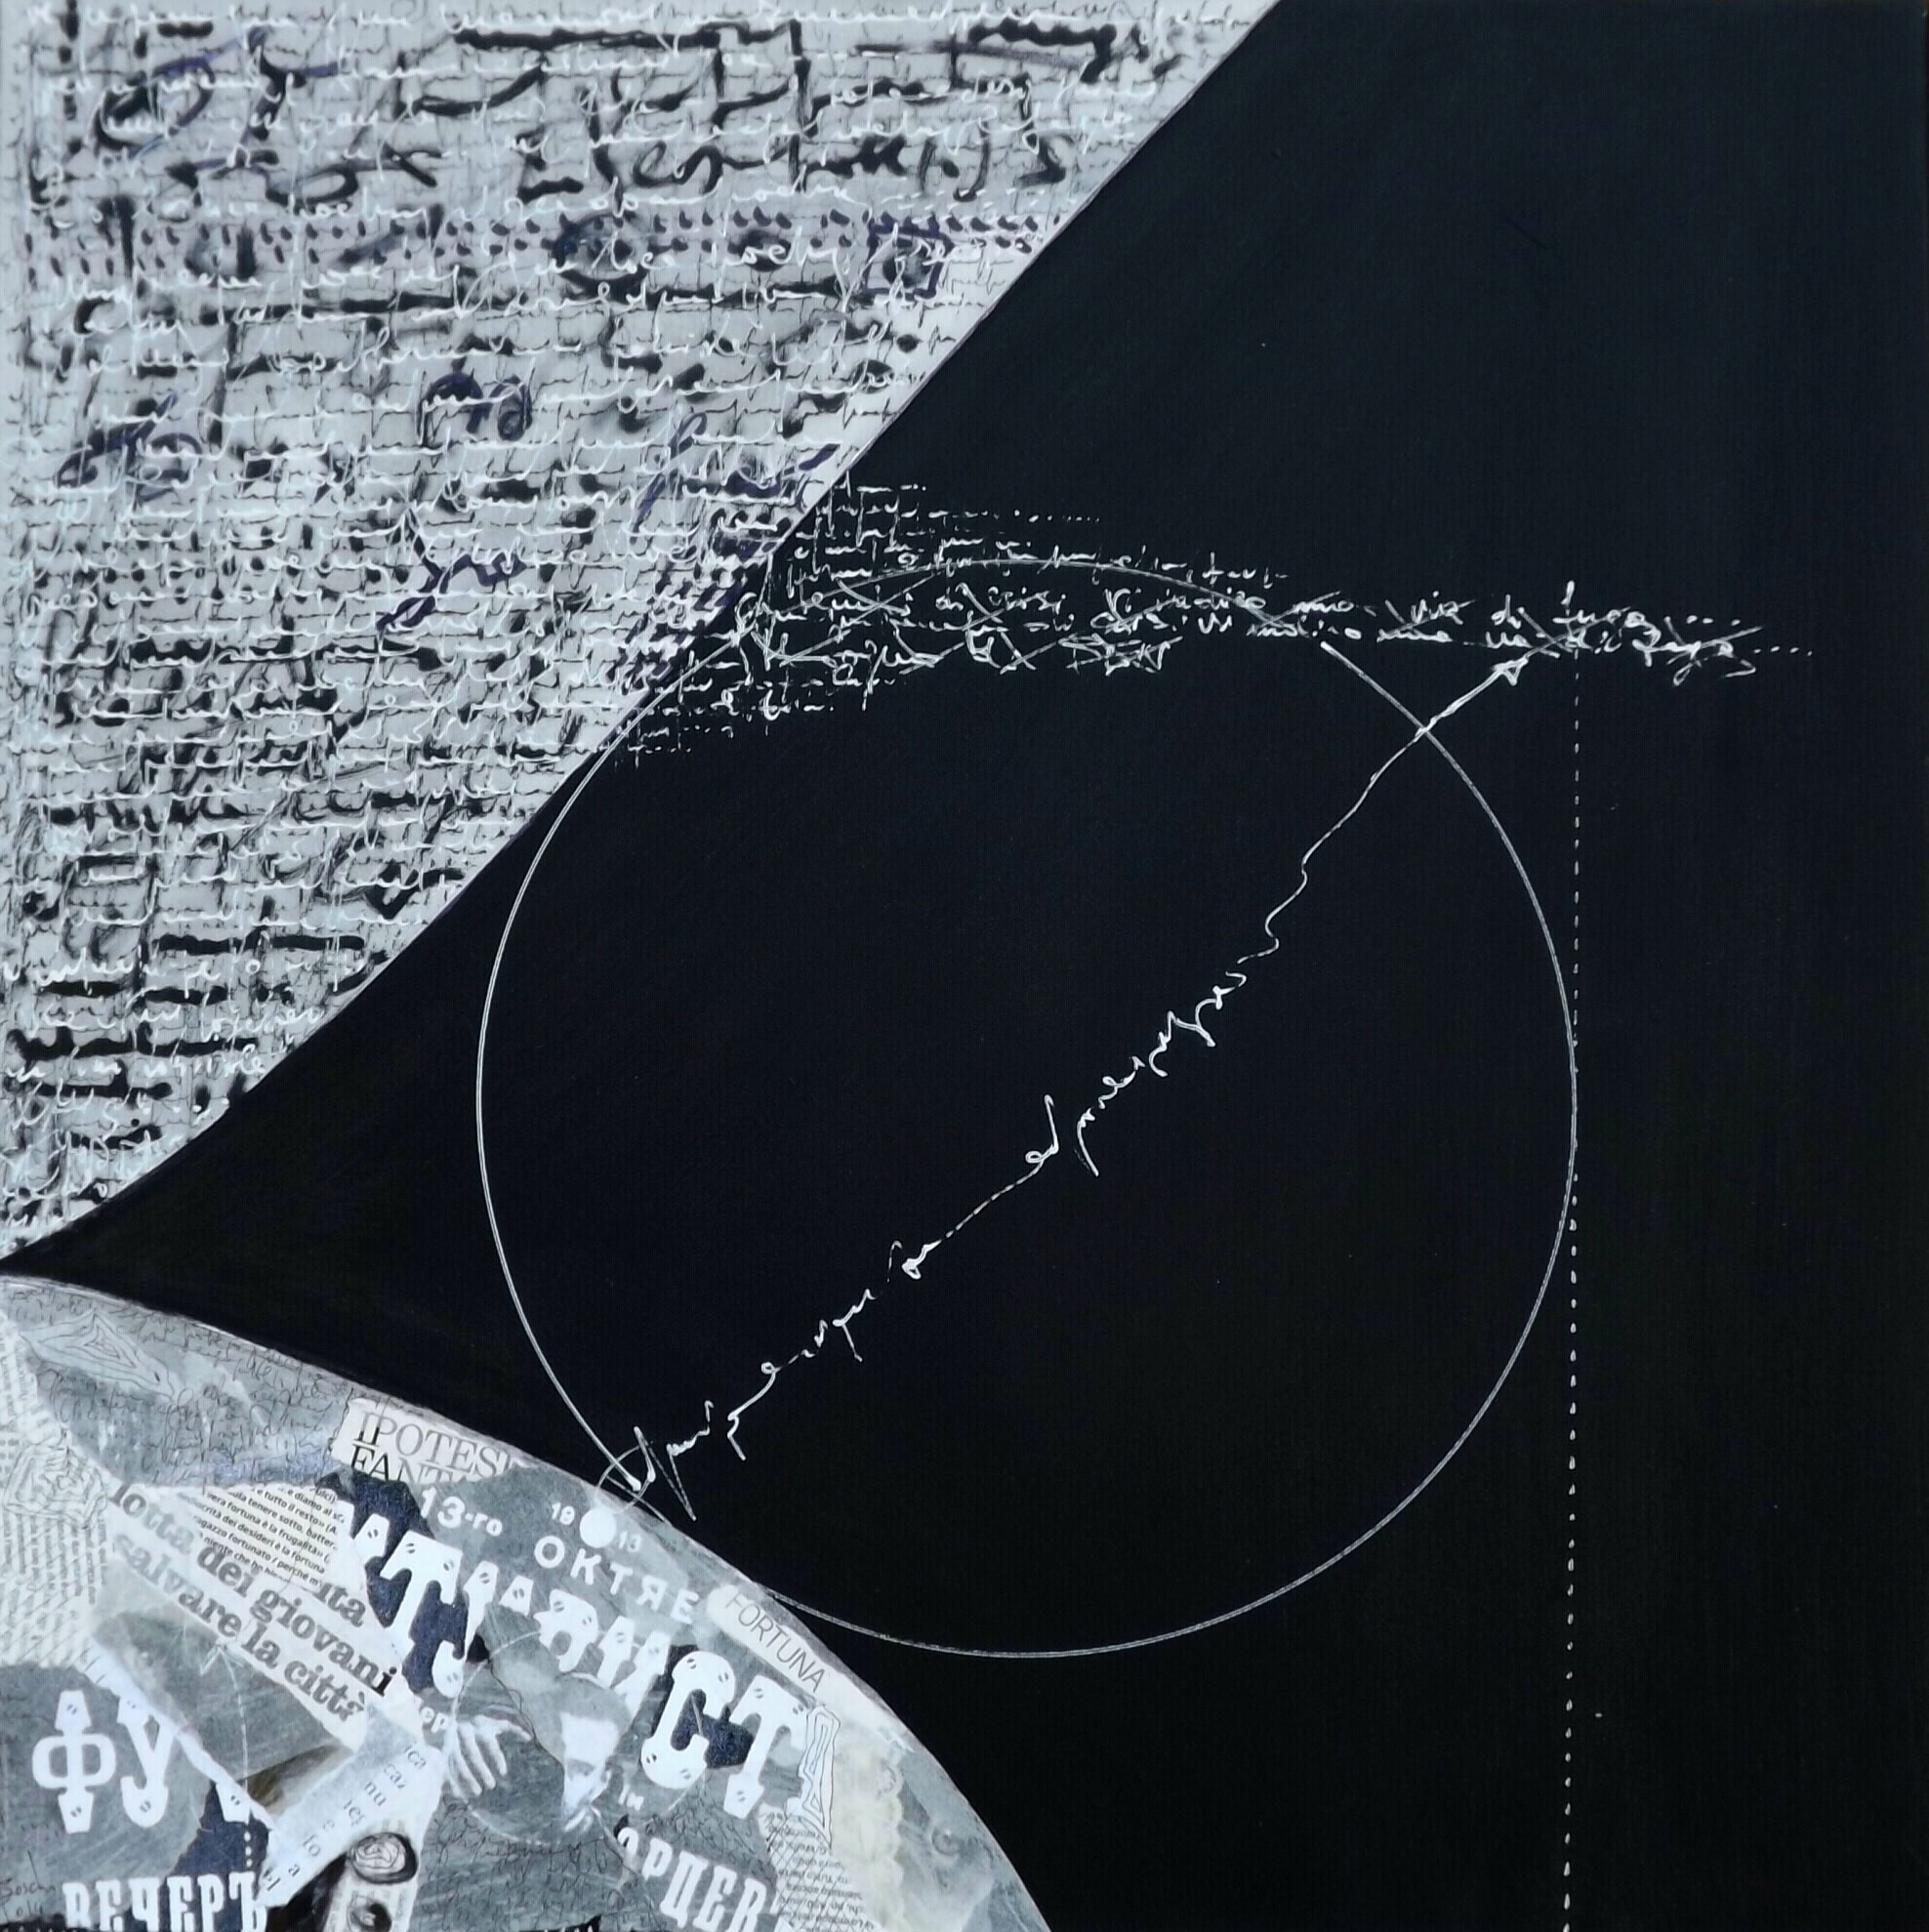 Lettera in ombra 4, 2014 - cm 50x50